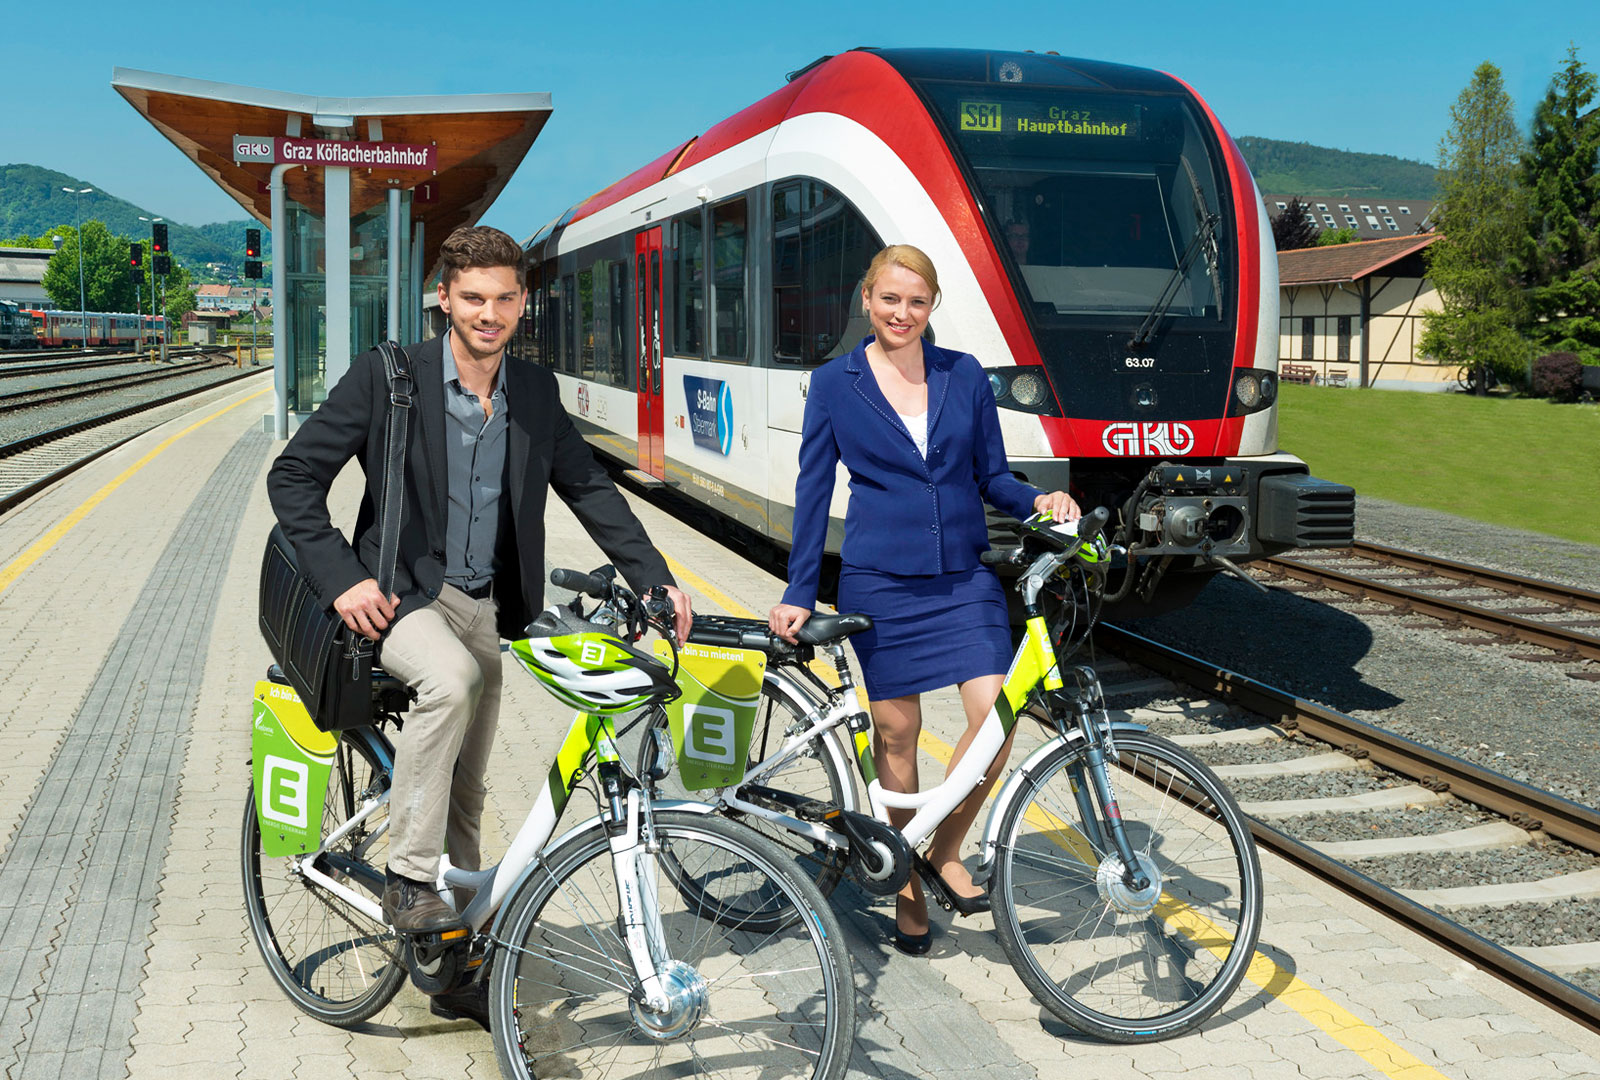 E-Bike – S-Bahn 1